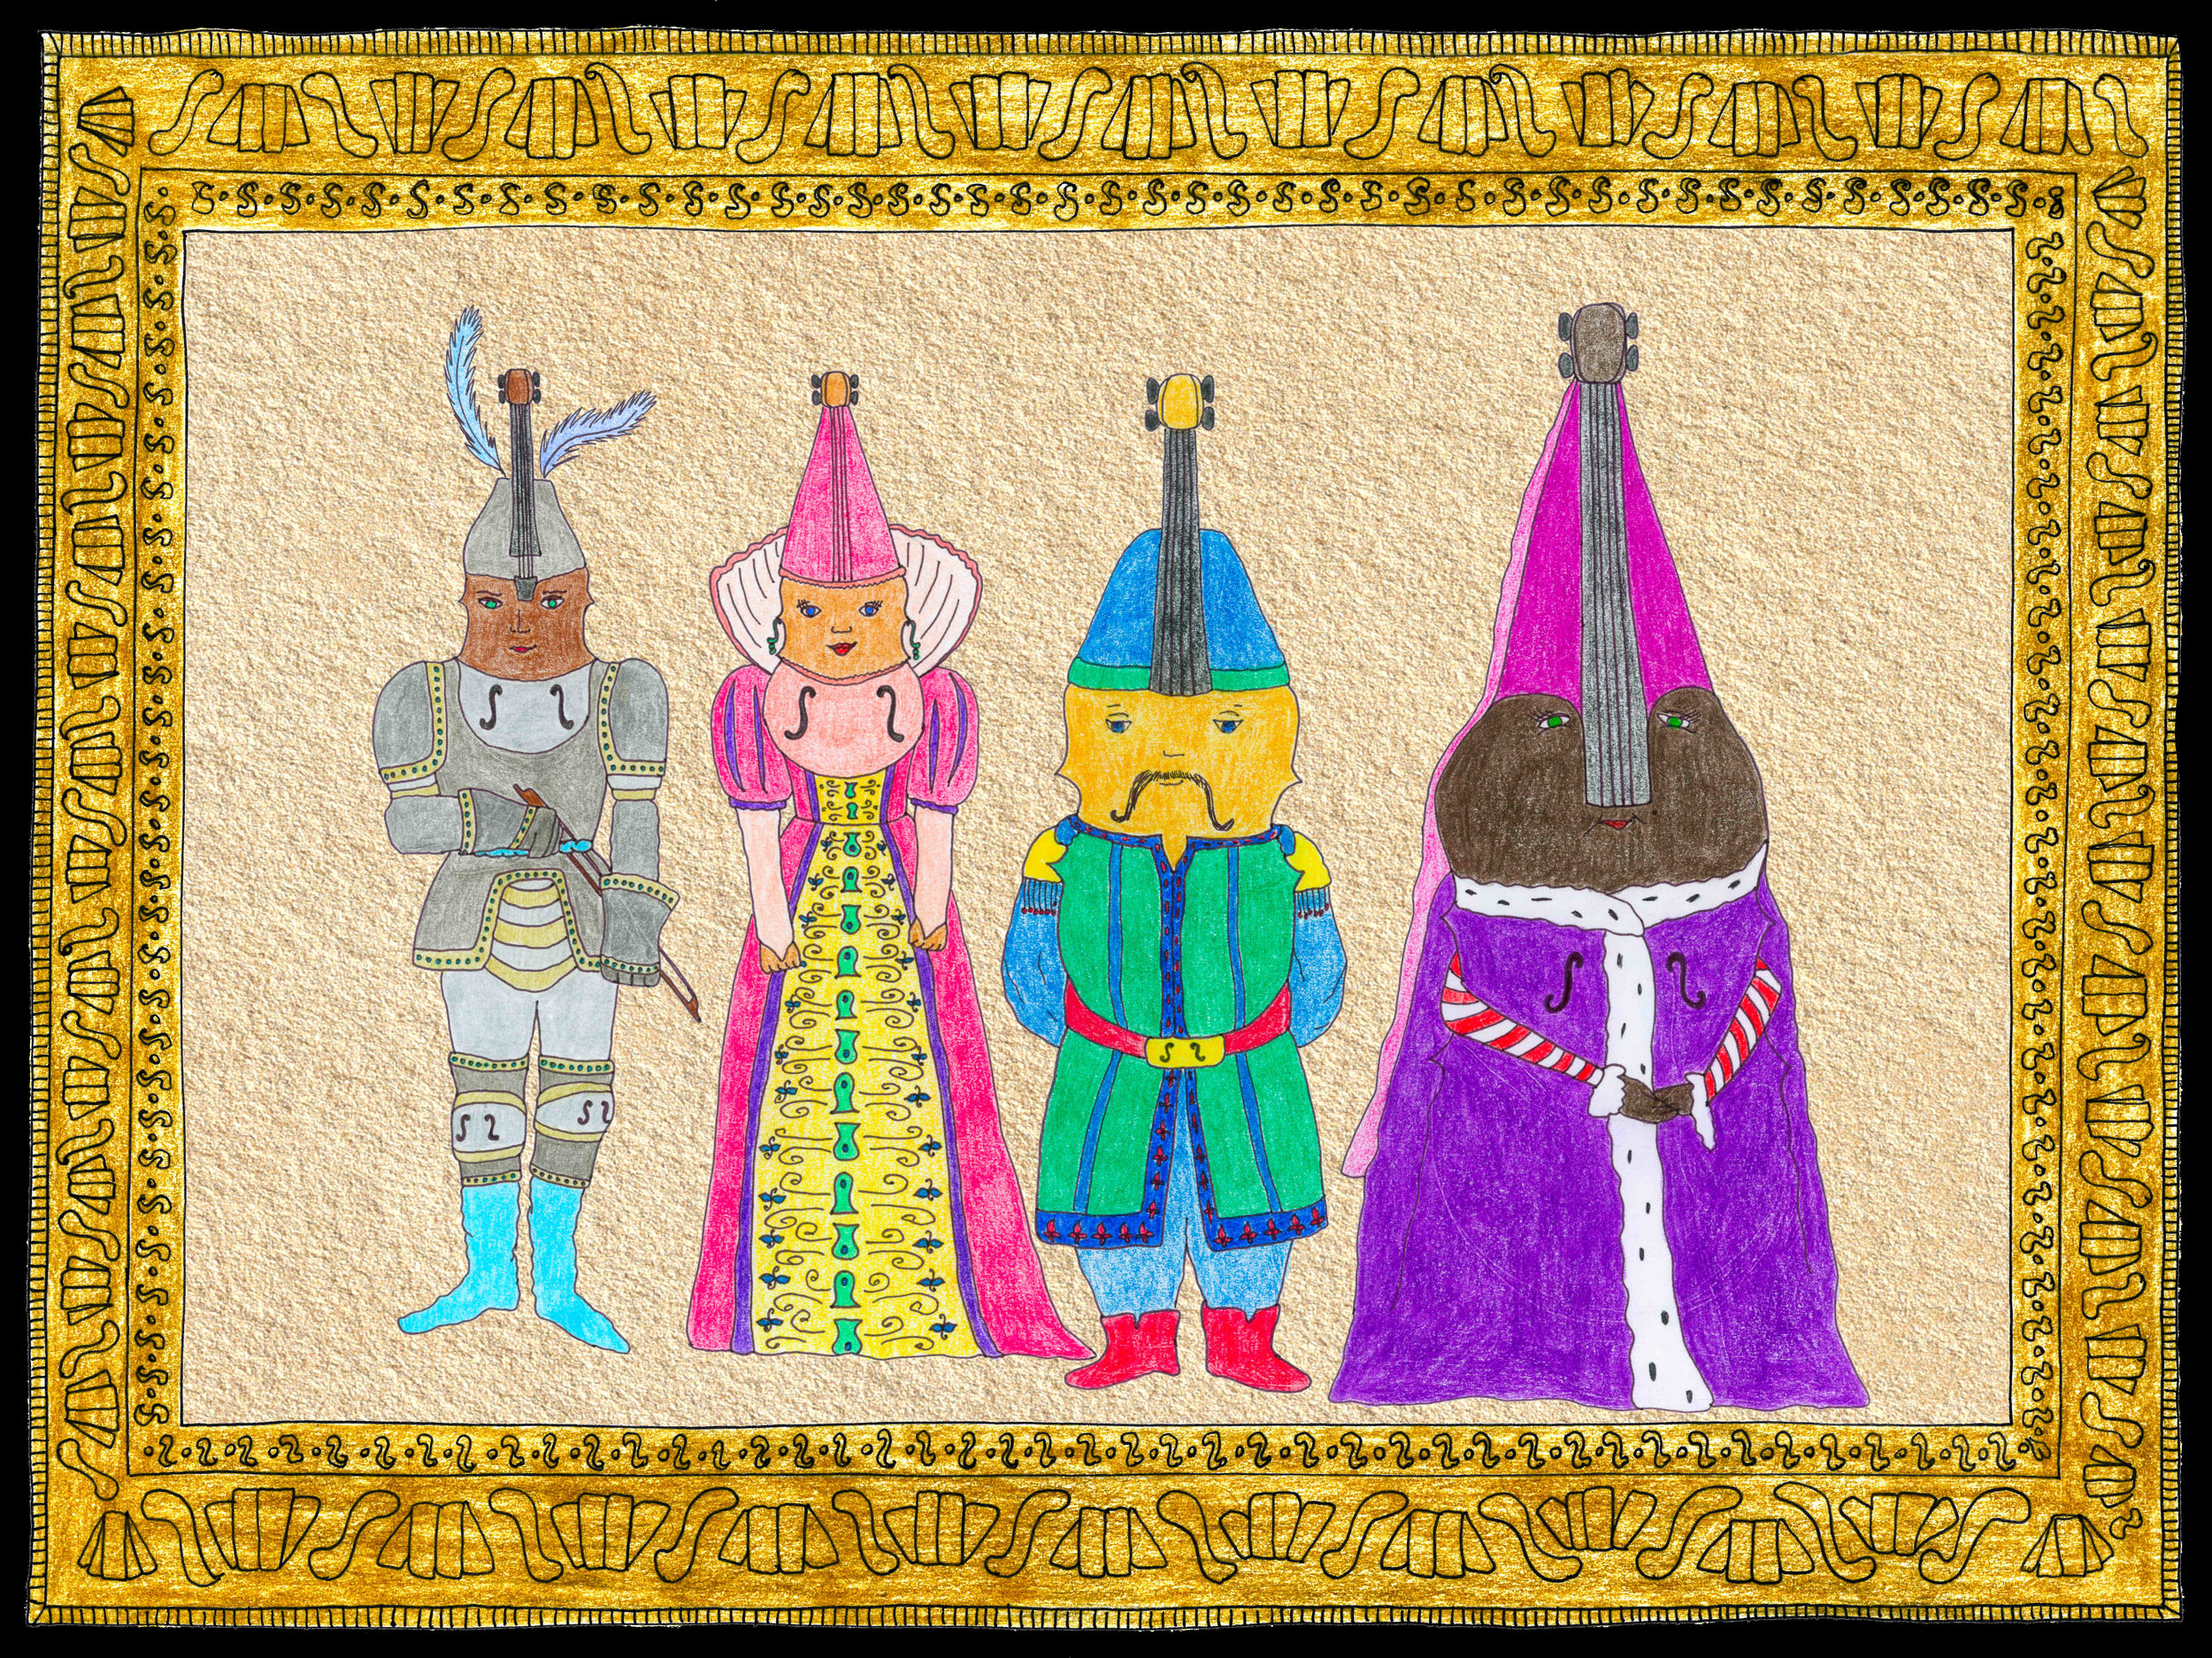 Creative Images - artwork that is inclusive, descriptive and piques kids' imaginations